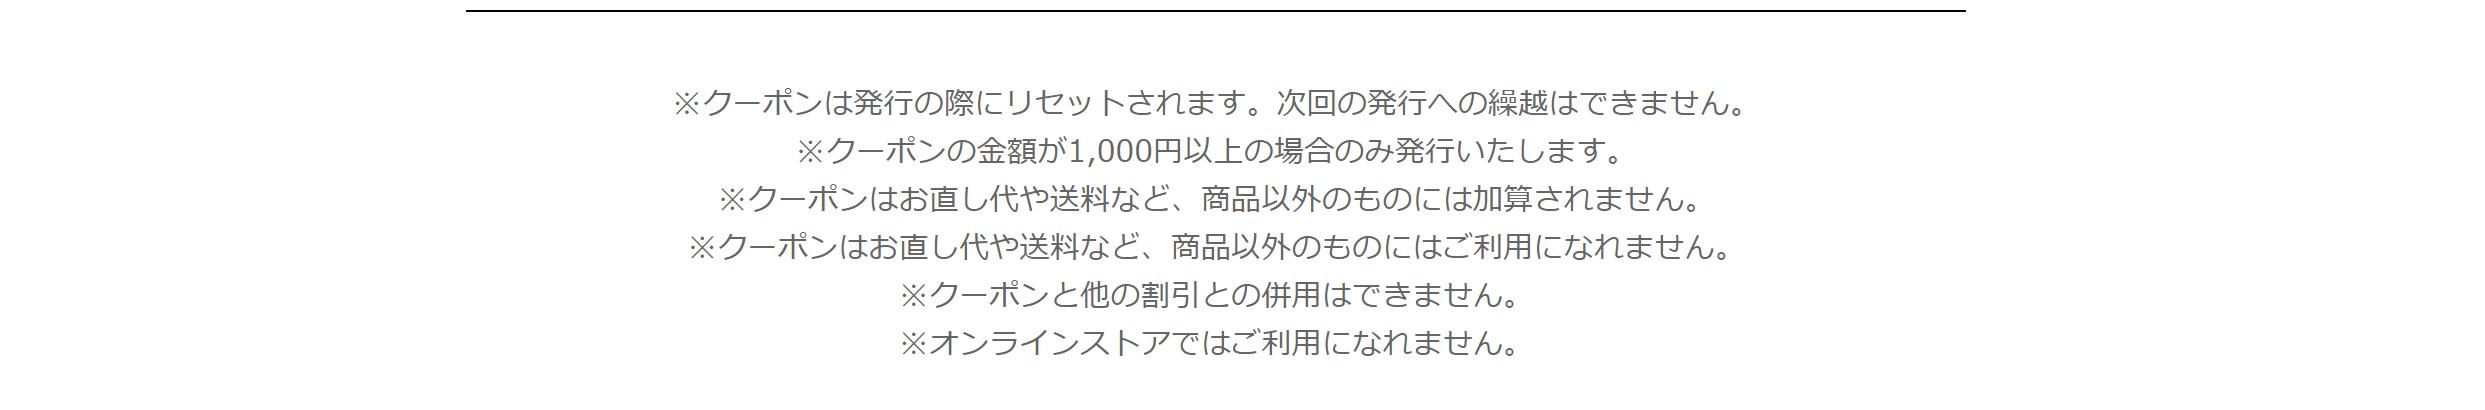 SnapCrab_NoName_2019-2-25_20-11-18_No-00